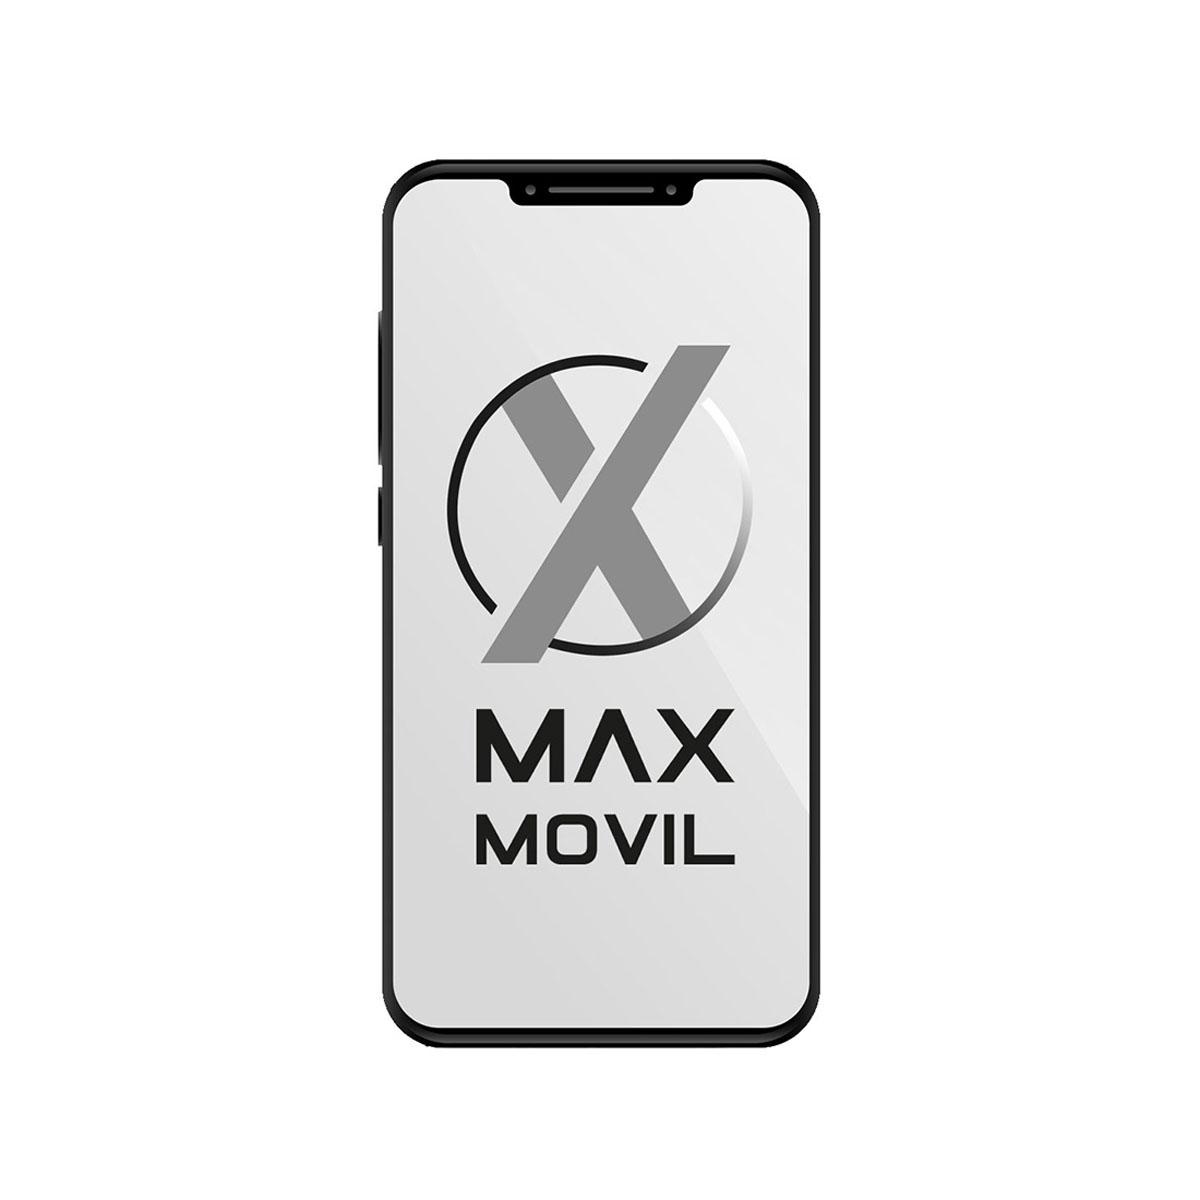 Funda para iPhone 12 Pro Max transparente con MagSafe de Apple